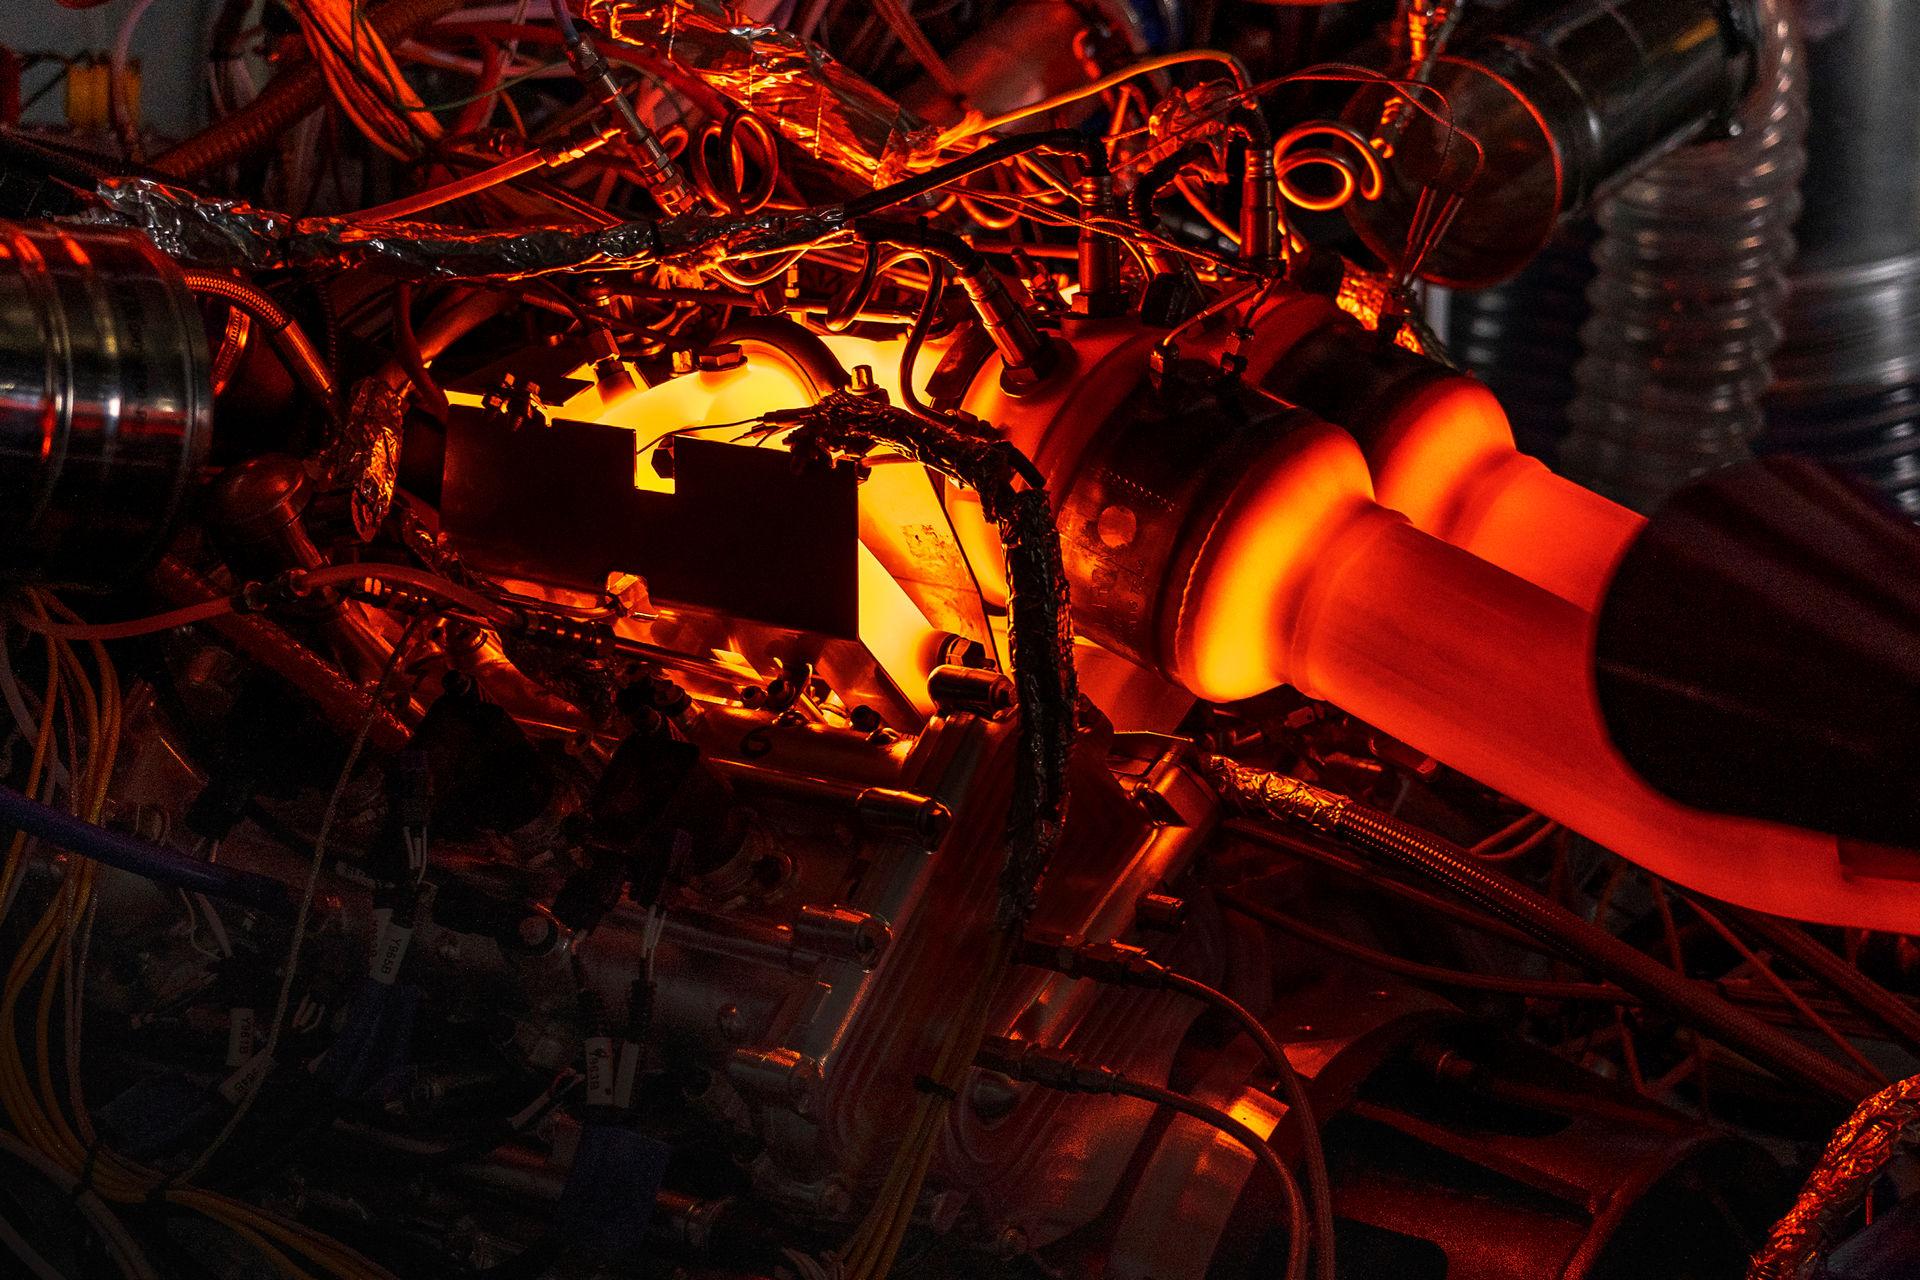 New-Aston-Martin-V6-Engine-11